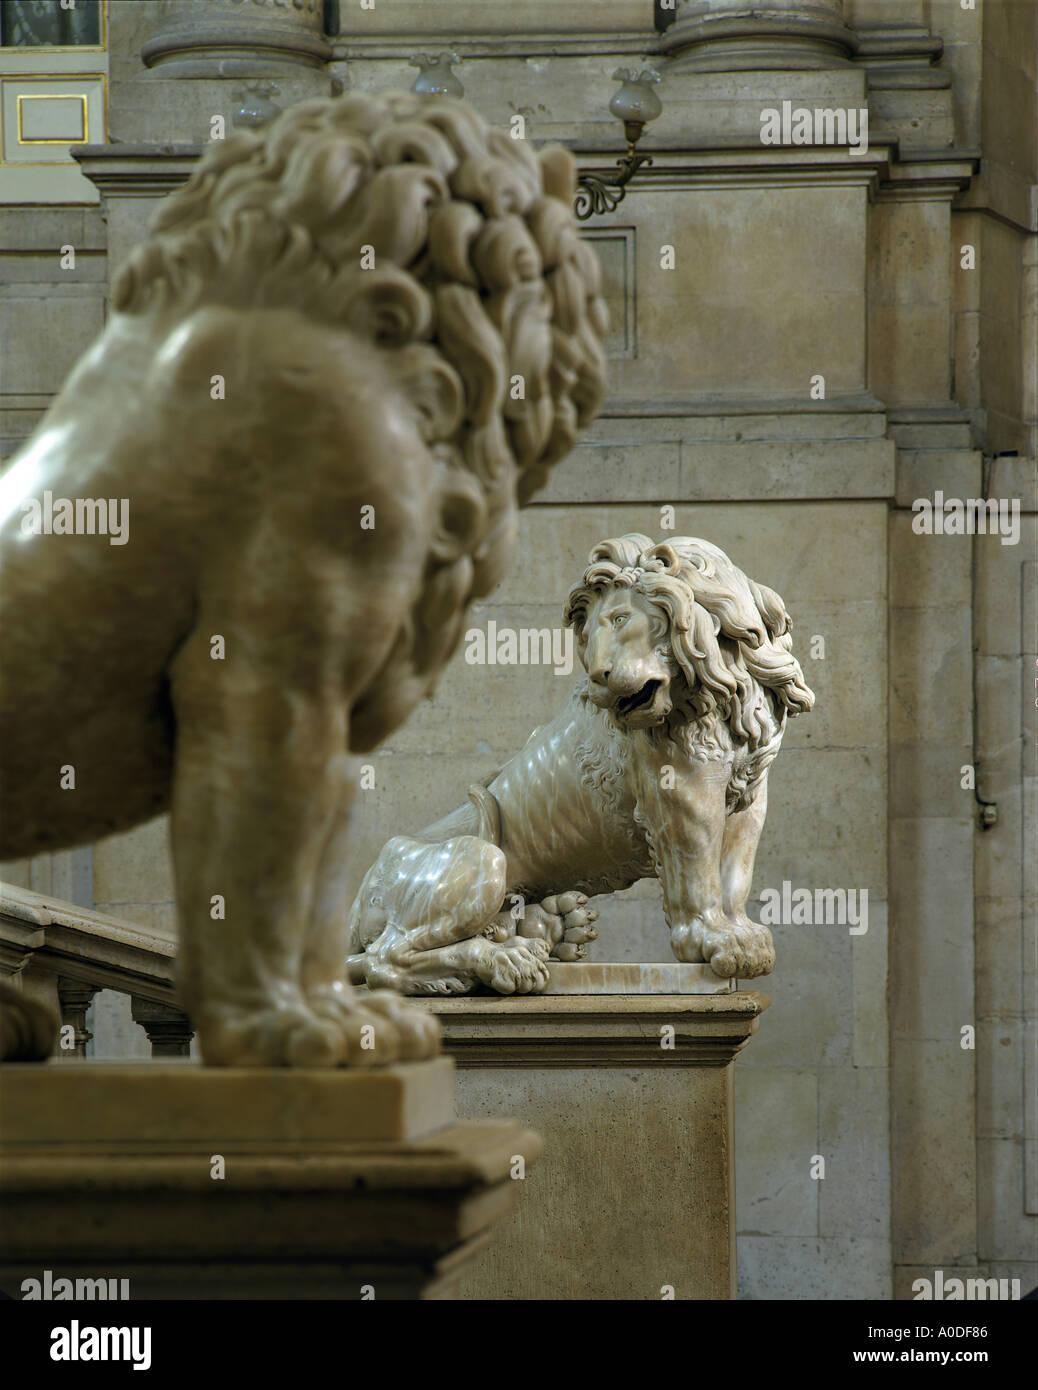 Lion Sculptures On The Grand Staircase. Architect: Felipe De Castro And  Robert Michel   Sculptors